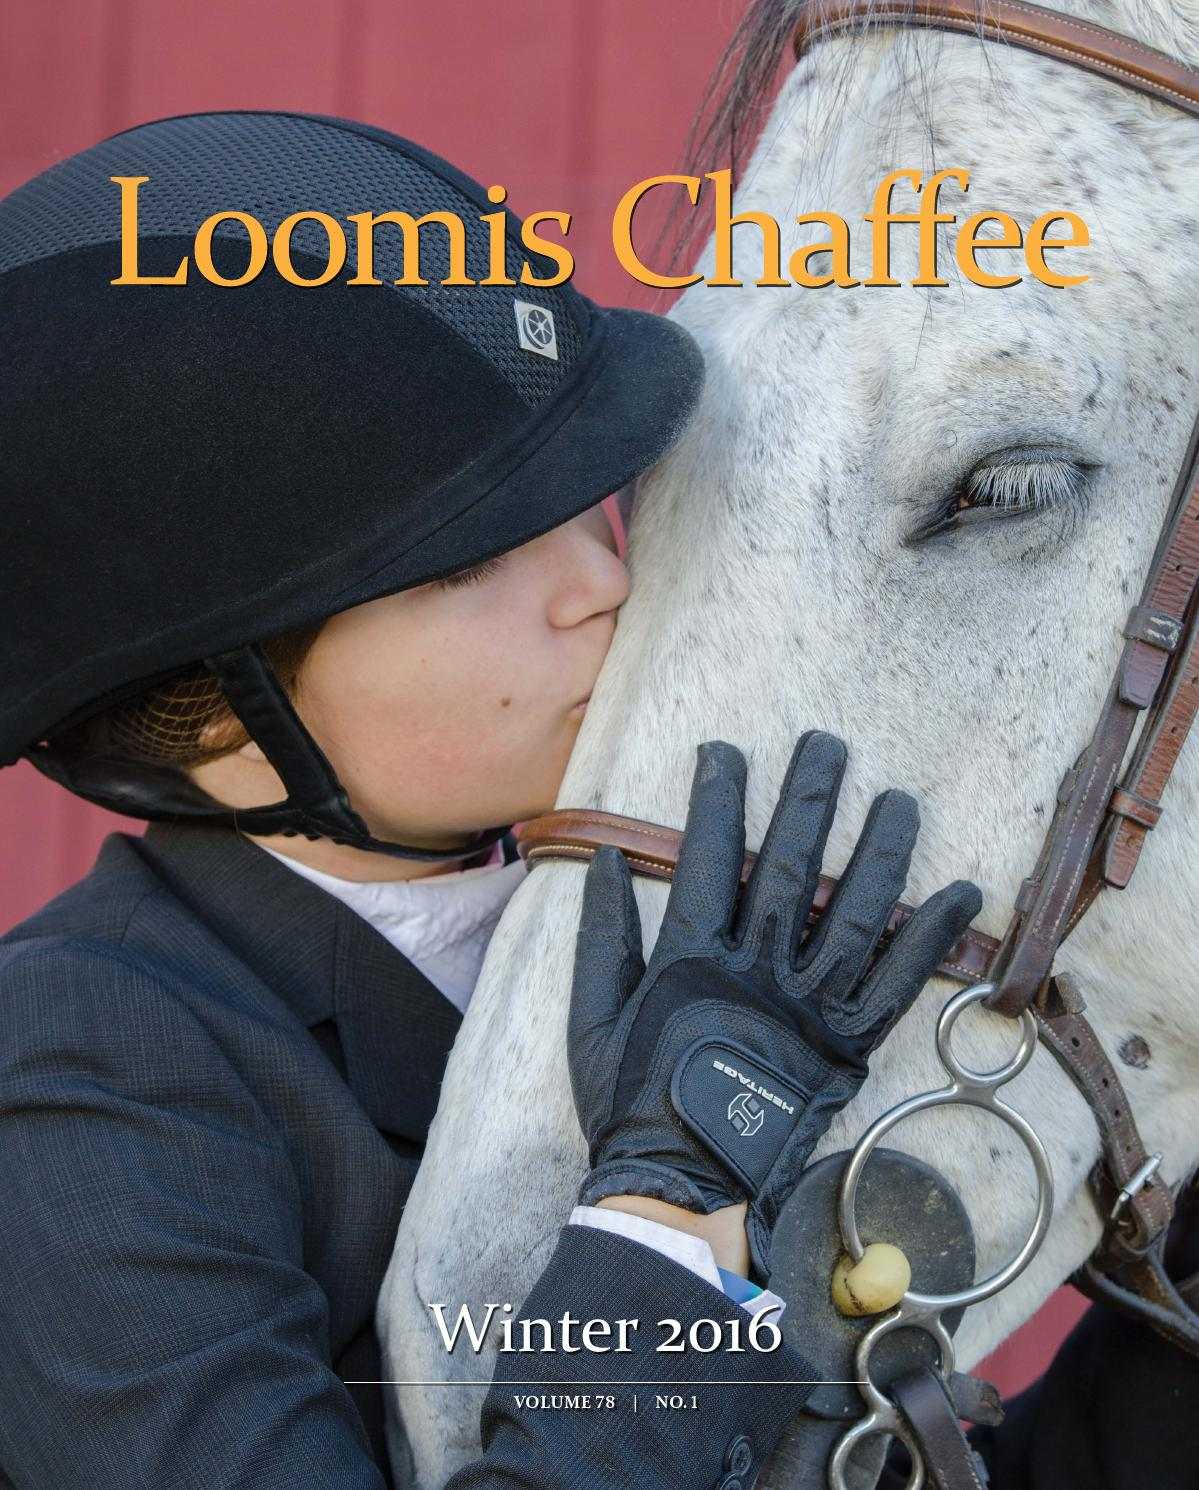 Loomis Chaffee magazine Summer 2015 by Loomis Chaffee issuu